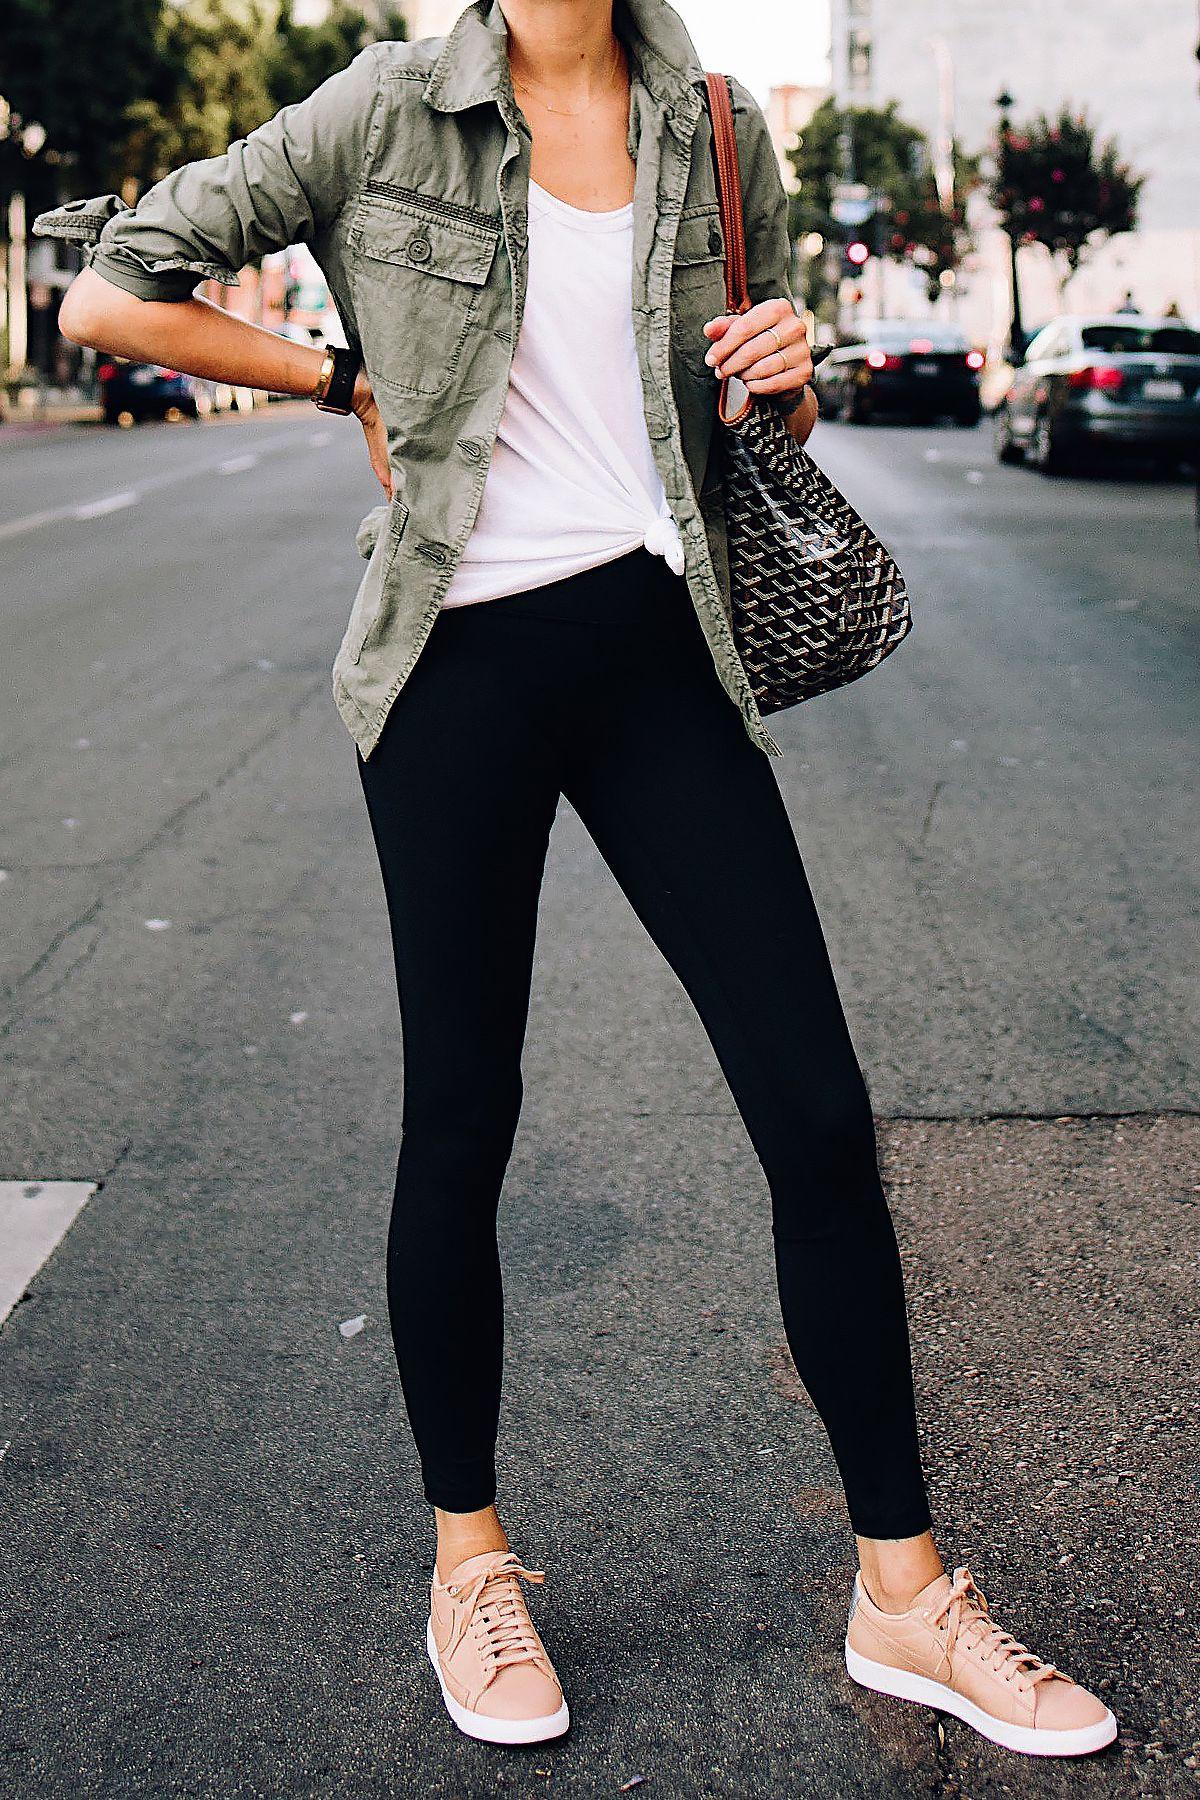 Fashion Jackson Nordstrom Green Utility Jacket White Tshirt Black Leggings Nike Sneakers Beige Goyard Outfits With Leggings Tshirt Outfits Casual Tshirt Outfit [ 1800 x 1200 Pixel ]